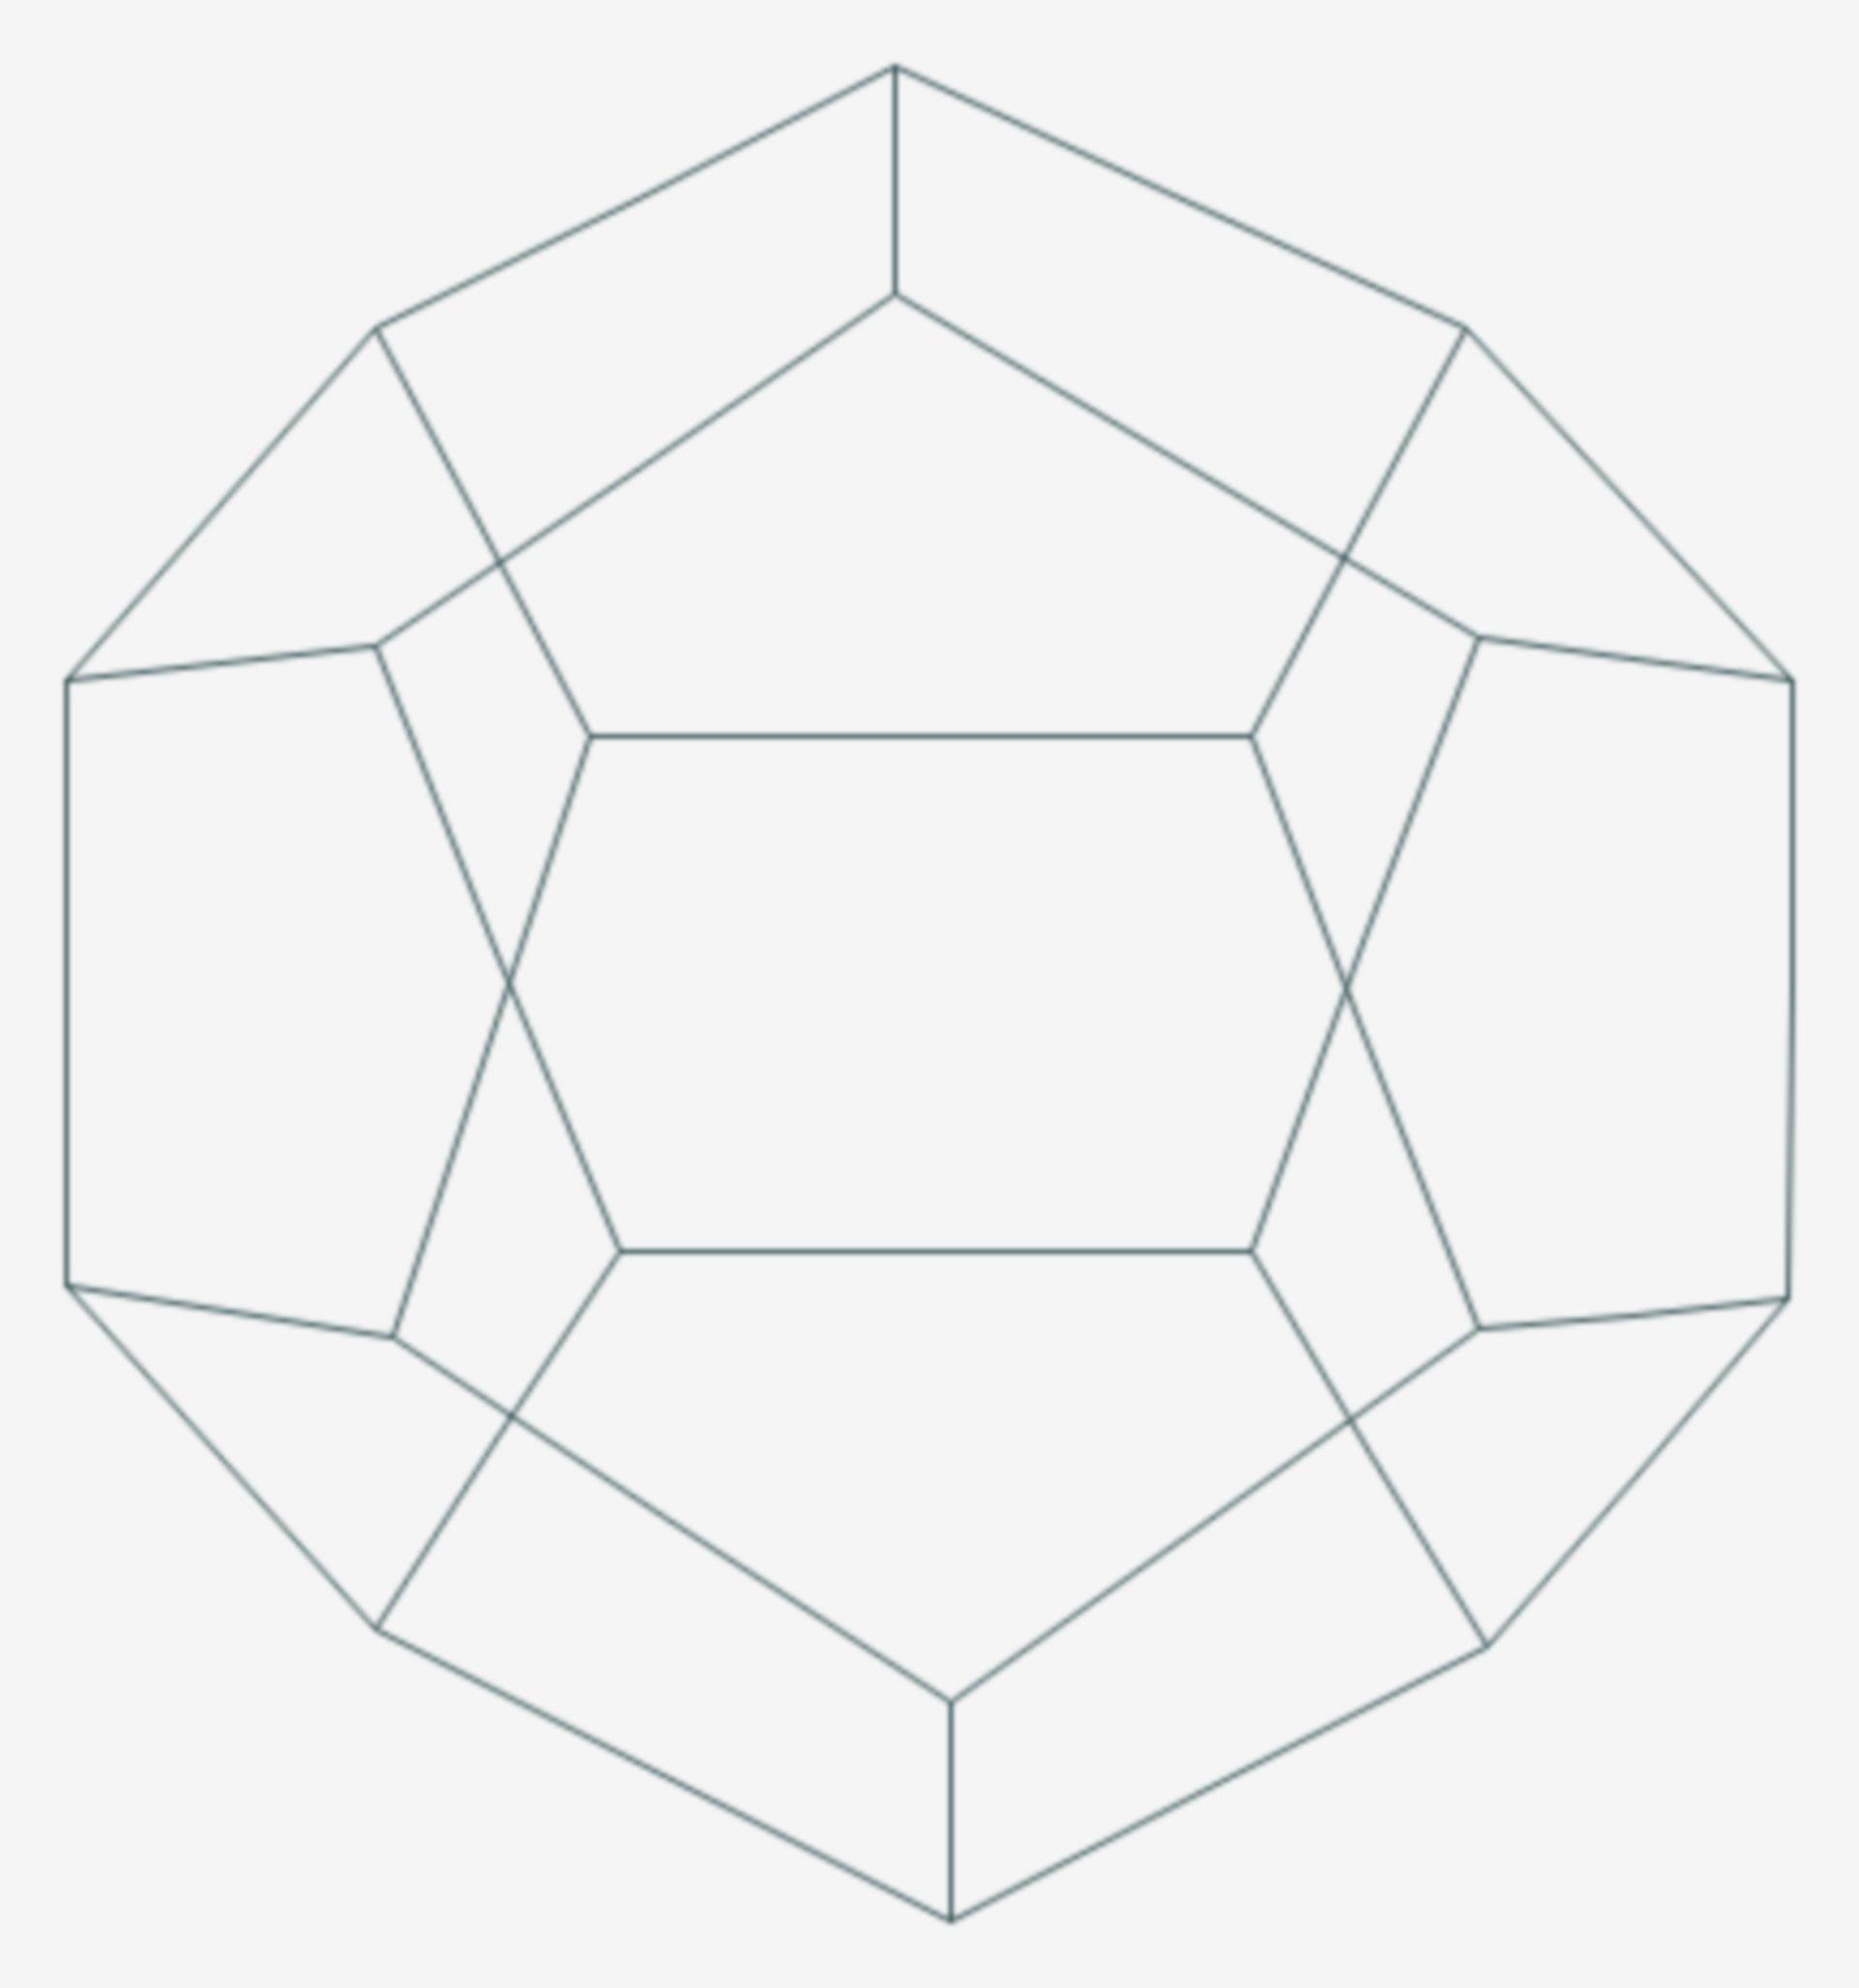 Dodecahedran (Strukturformel)